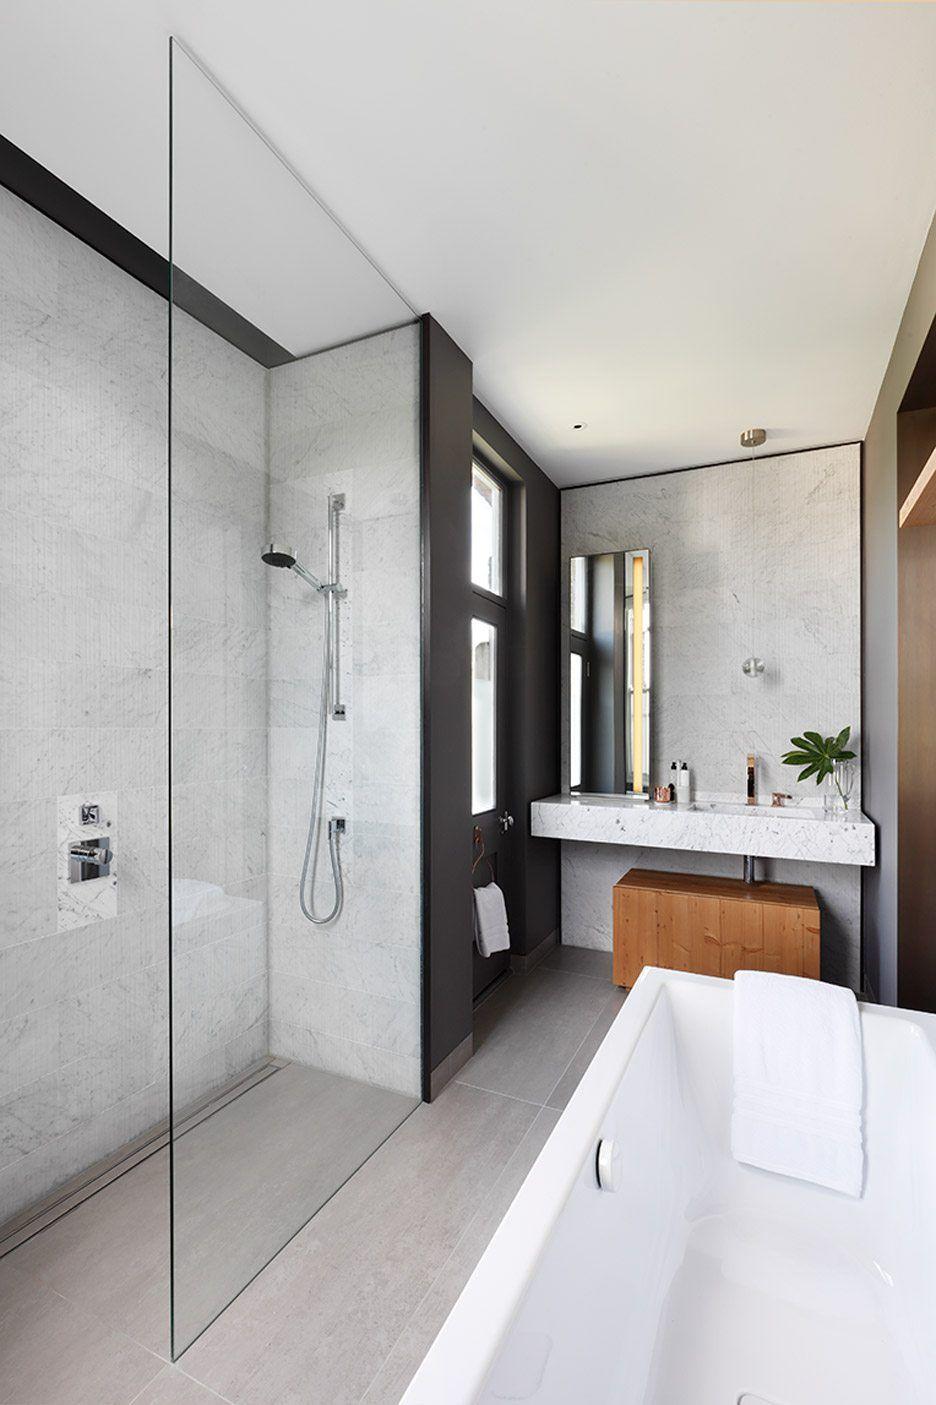 30 Modern Bathroom Ideas Large Tile Bathroom Contemporary Bathroom Designs Modern Contemporary Bathrooms